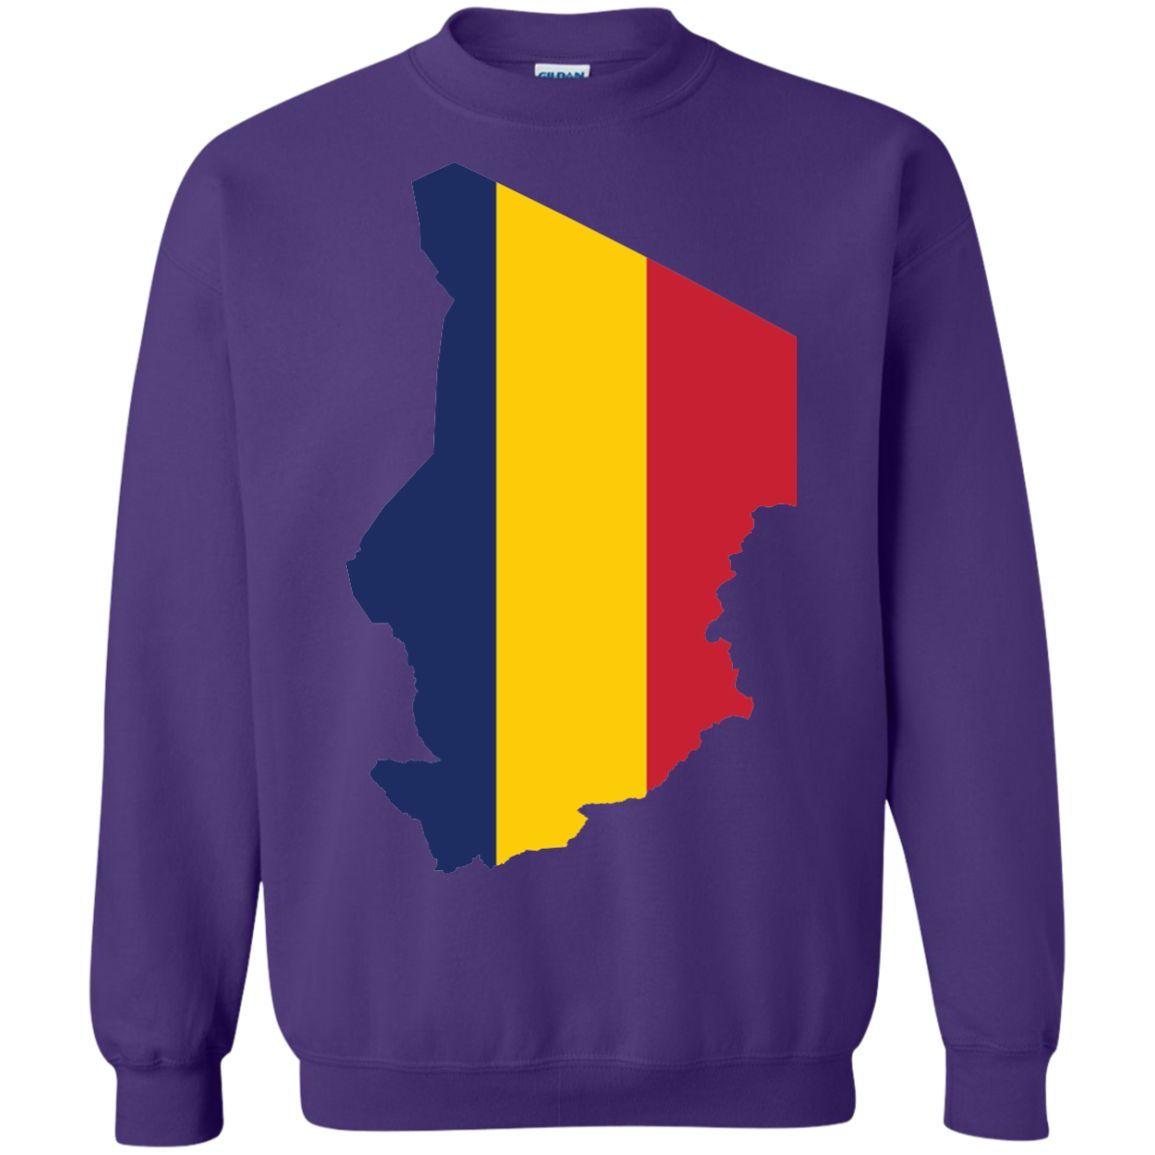 Chad flag -01 Printed Crewneck Pullover Sweatshirt 8 oz